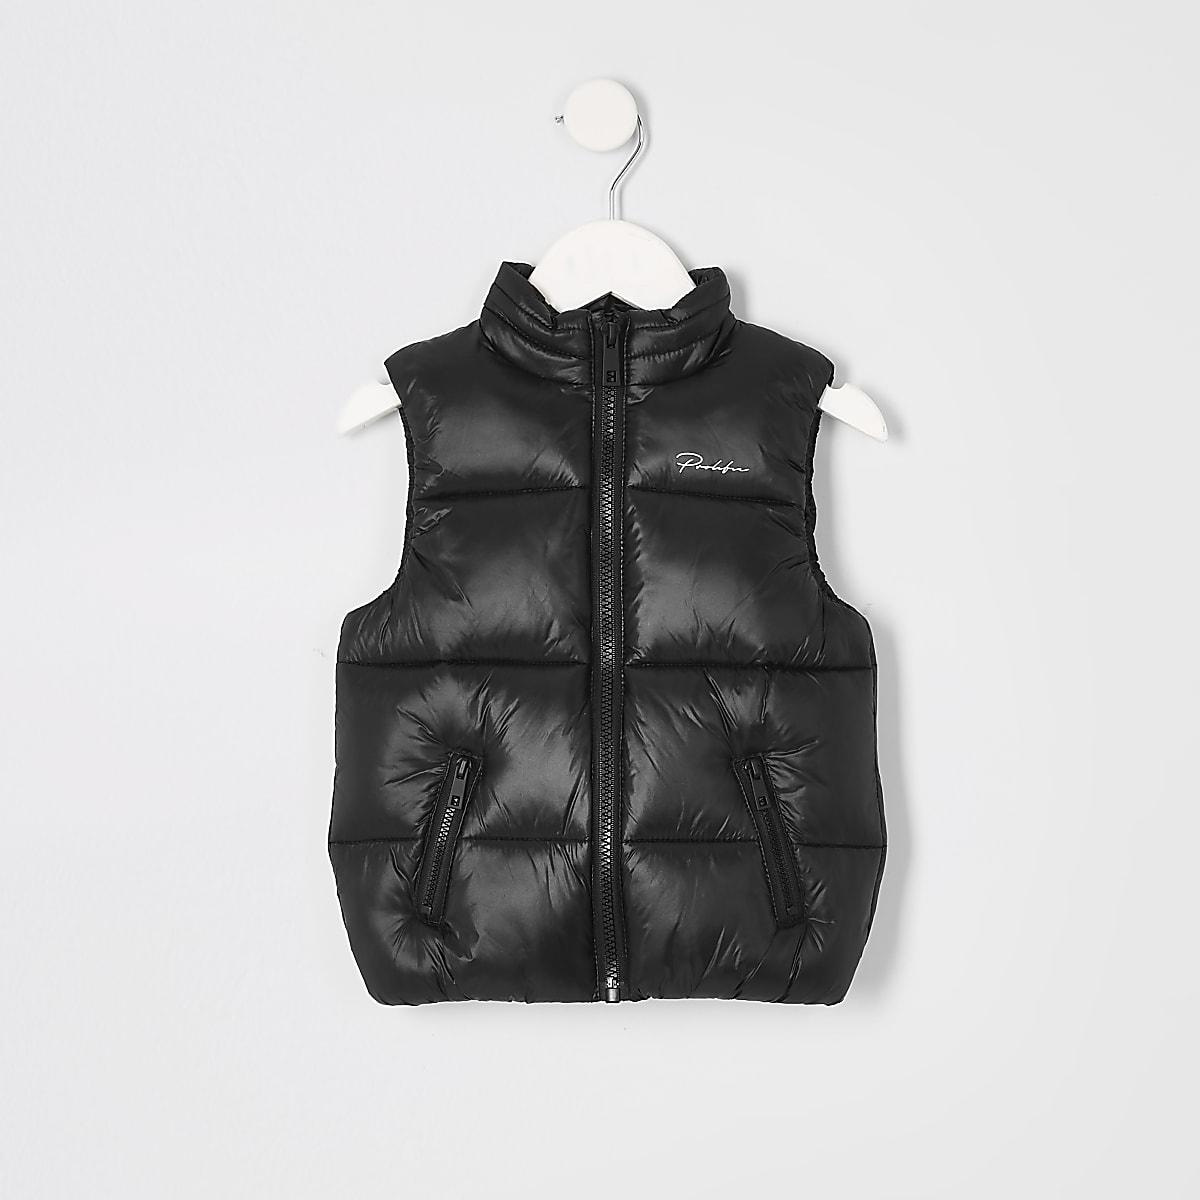 Mini boys black 'Prolific' vest